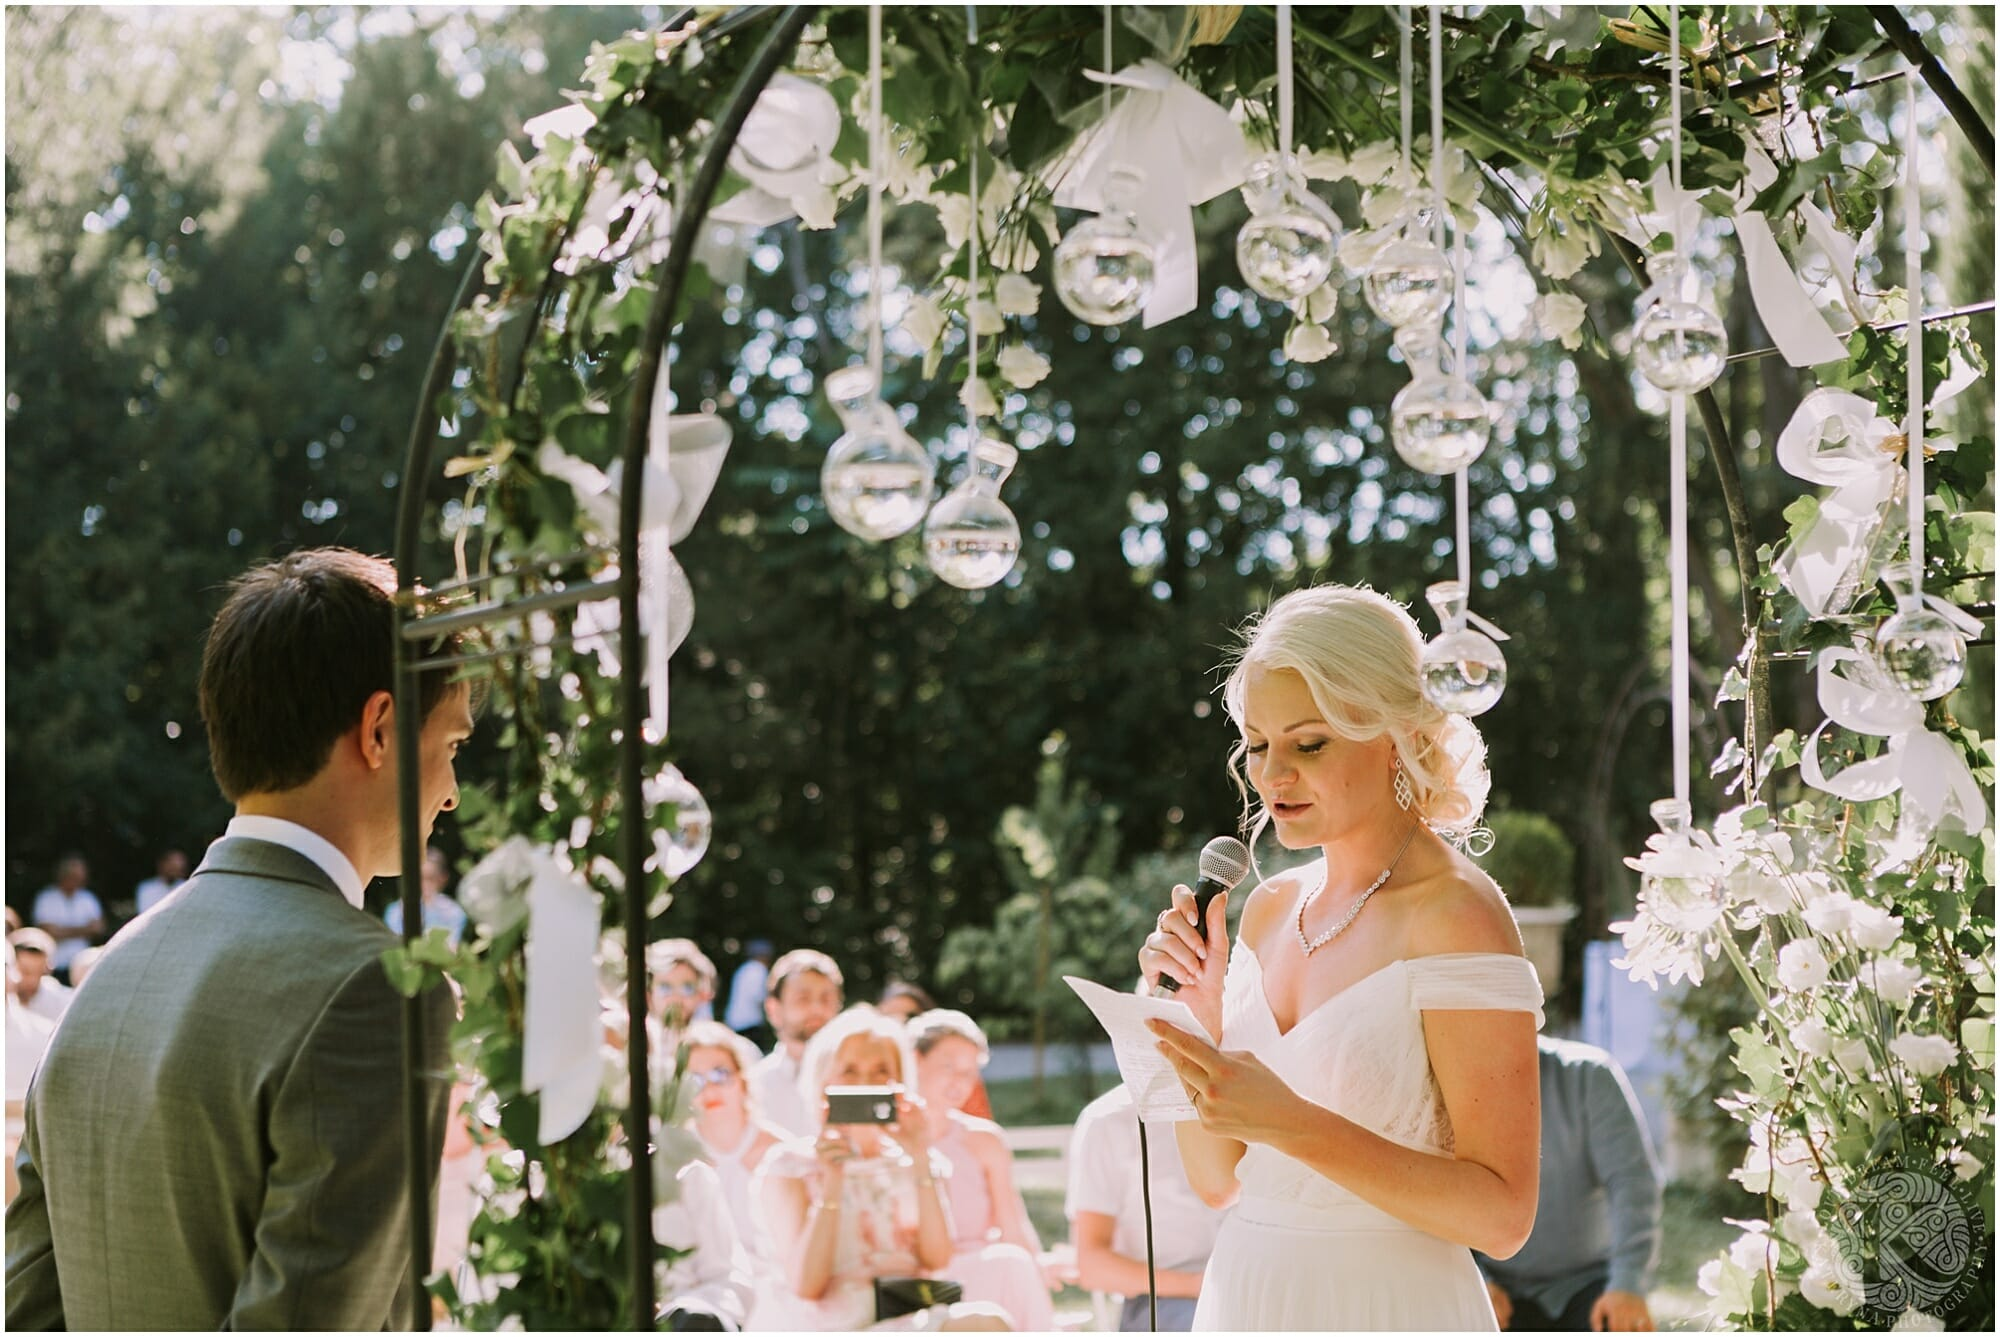 Kateryna-photos-photographe-mariage-chateau-des-3-fontaines-provence-avignon-vaucluse-sud_0051.jpg